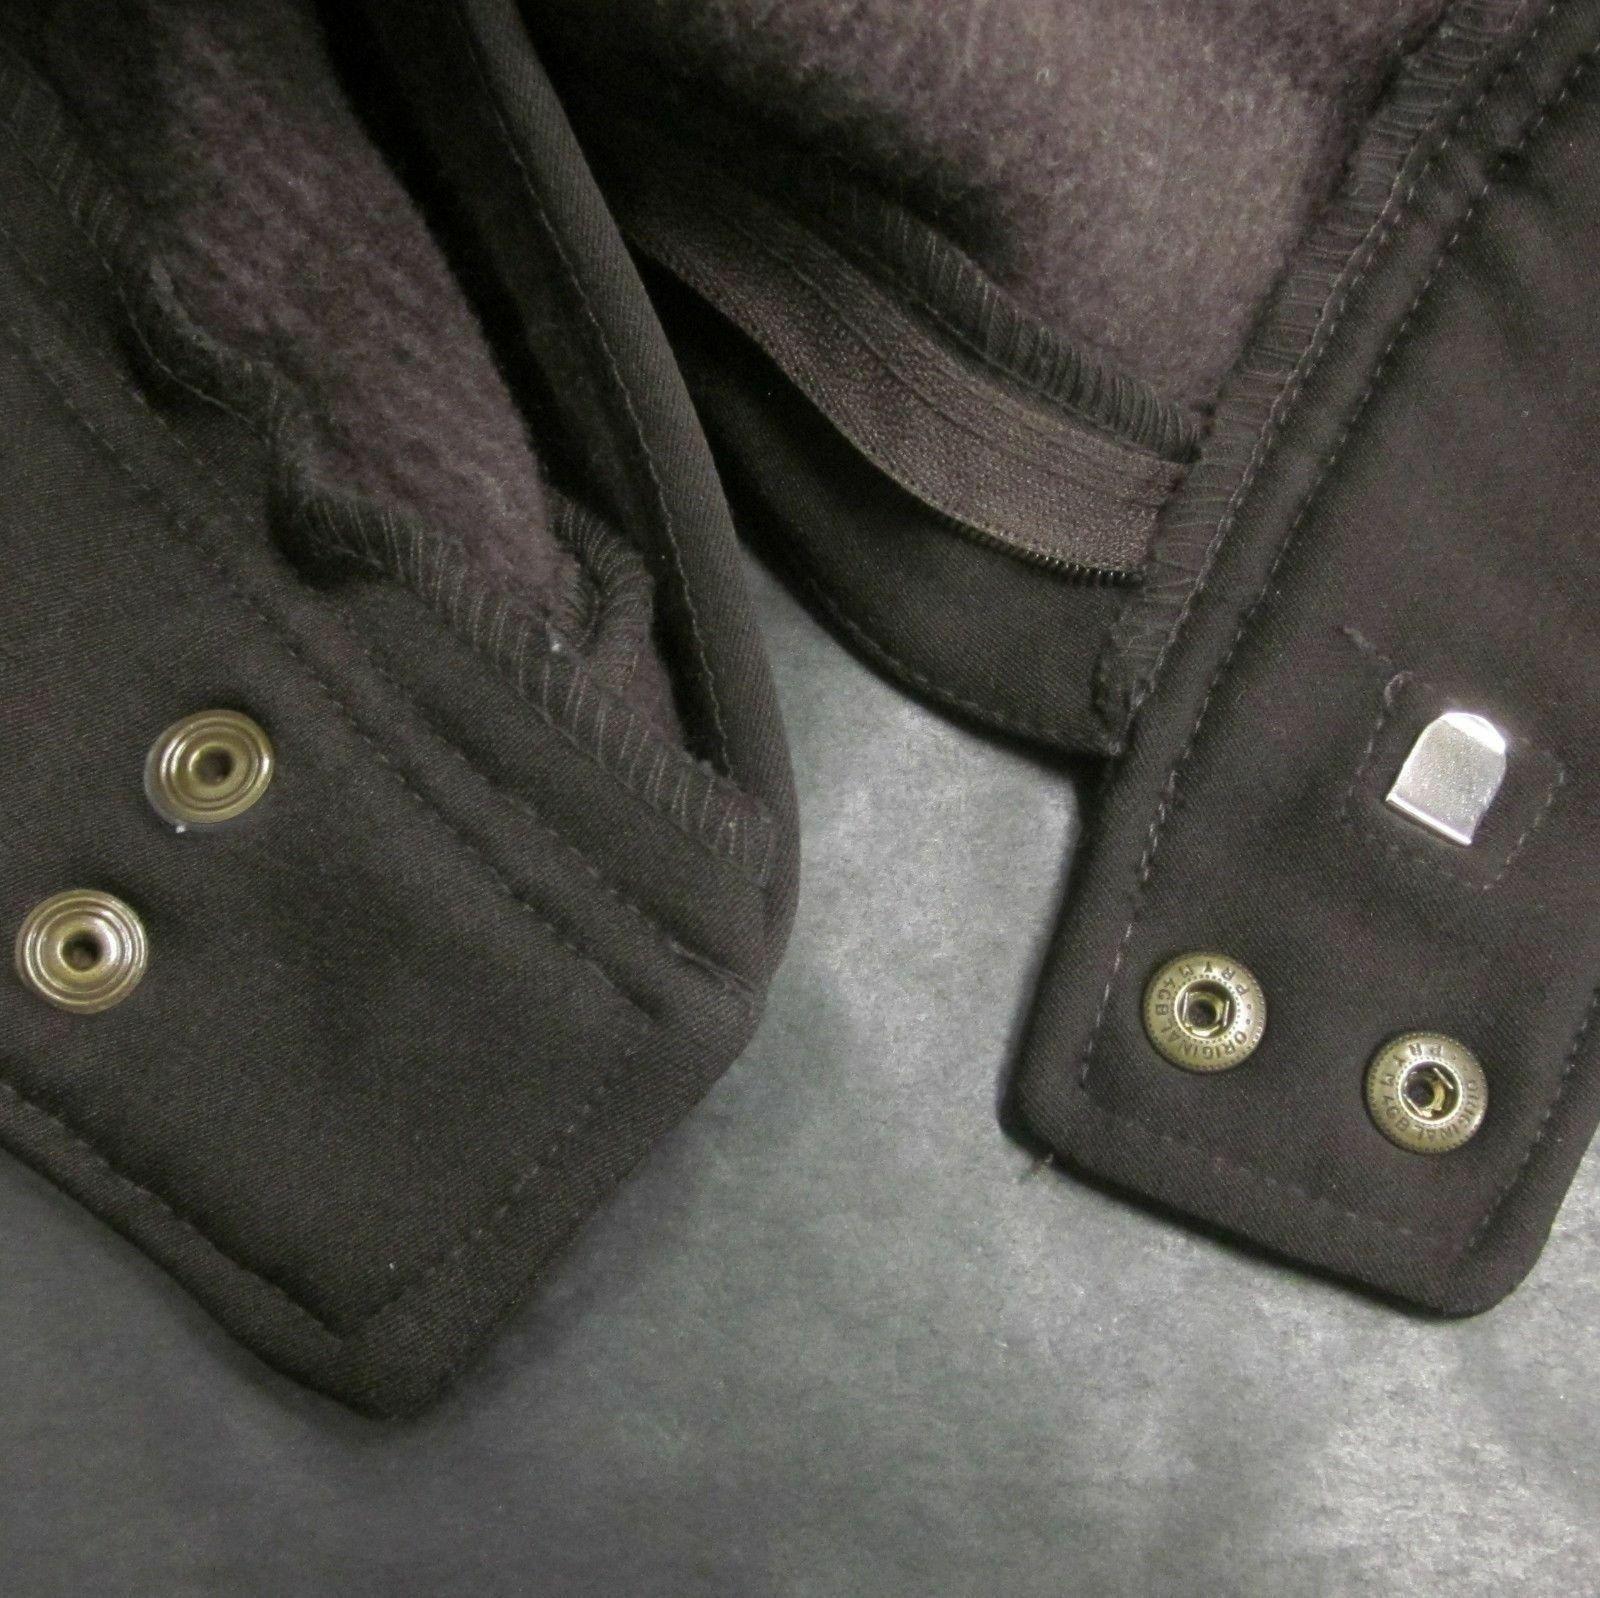 METROPOLIS WOMEN'S BROWN SKI STRETCH PANTS SKIFANS SCHOELLER COULOIR (8) (28X26)